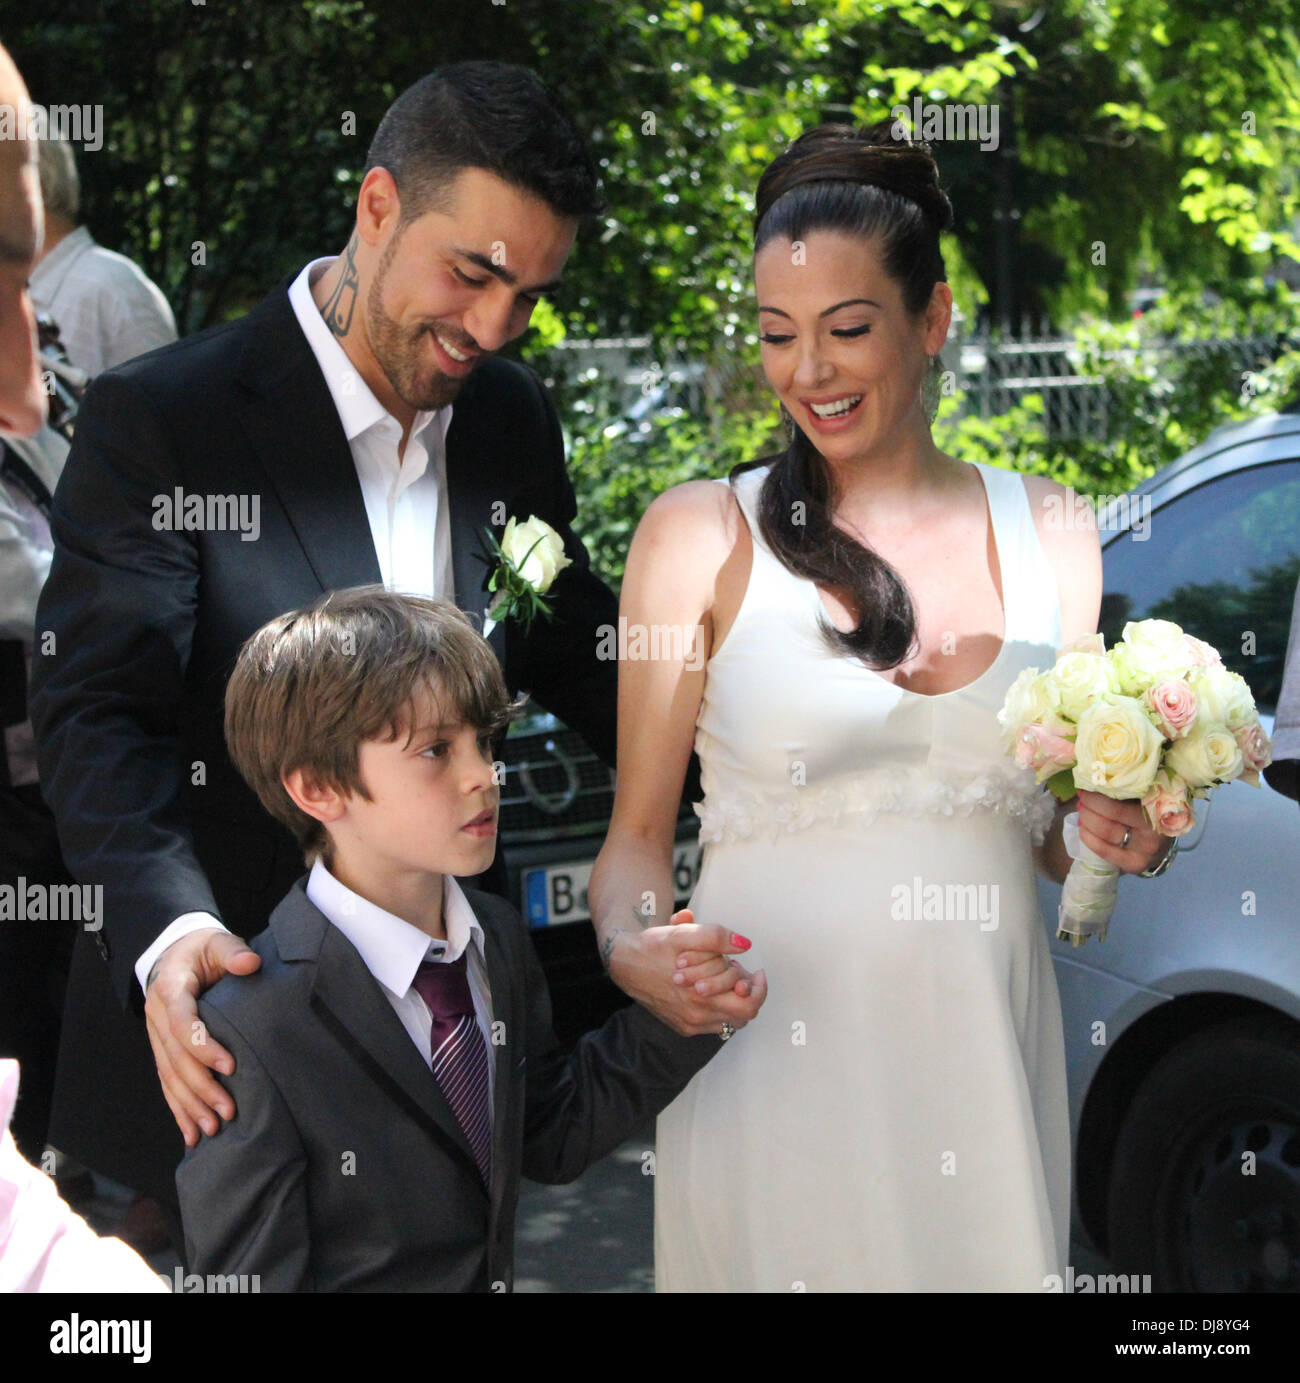 Heiraten in deutschland berlin